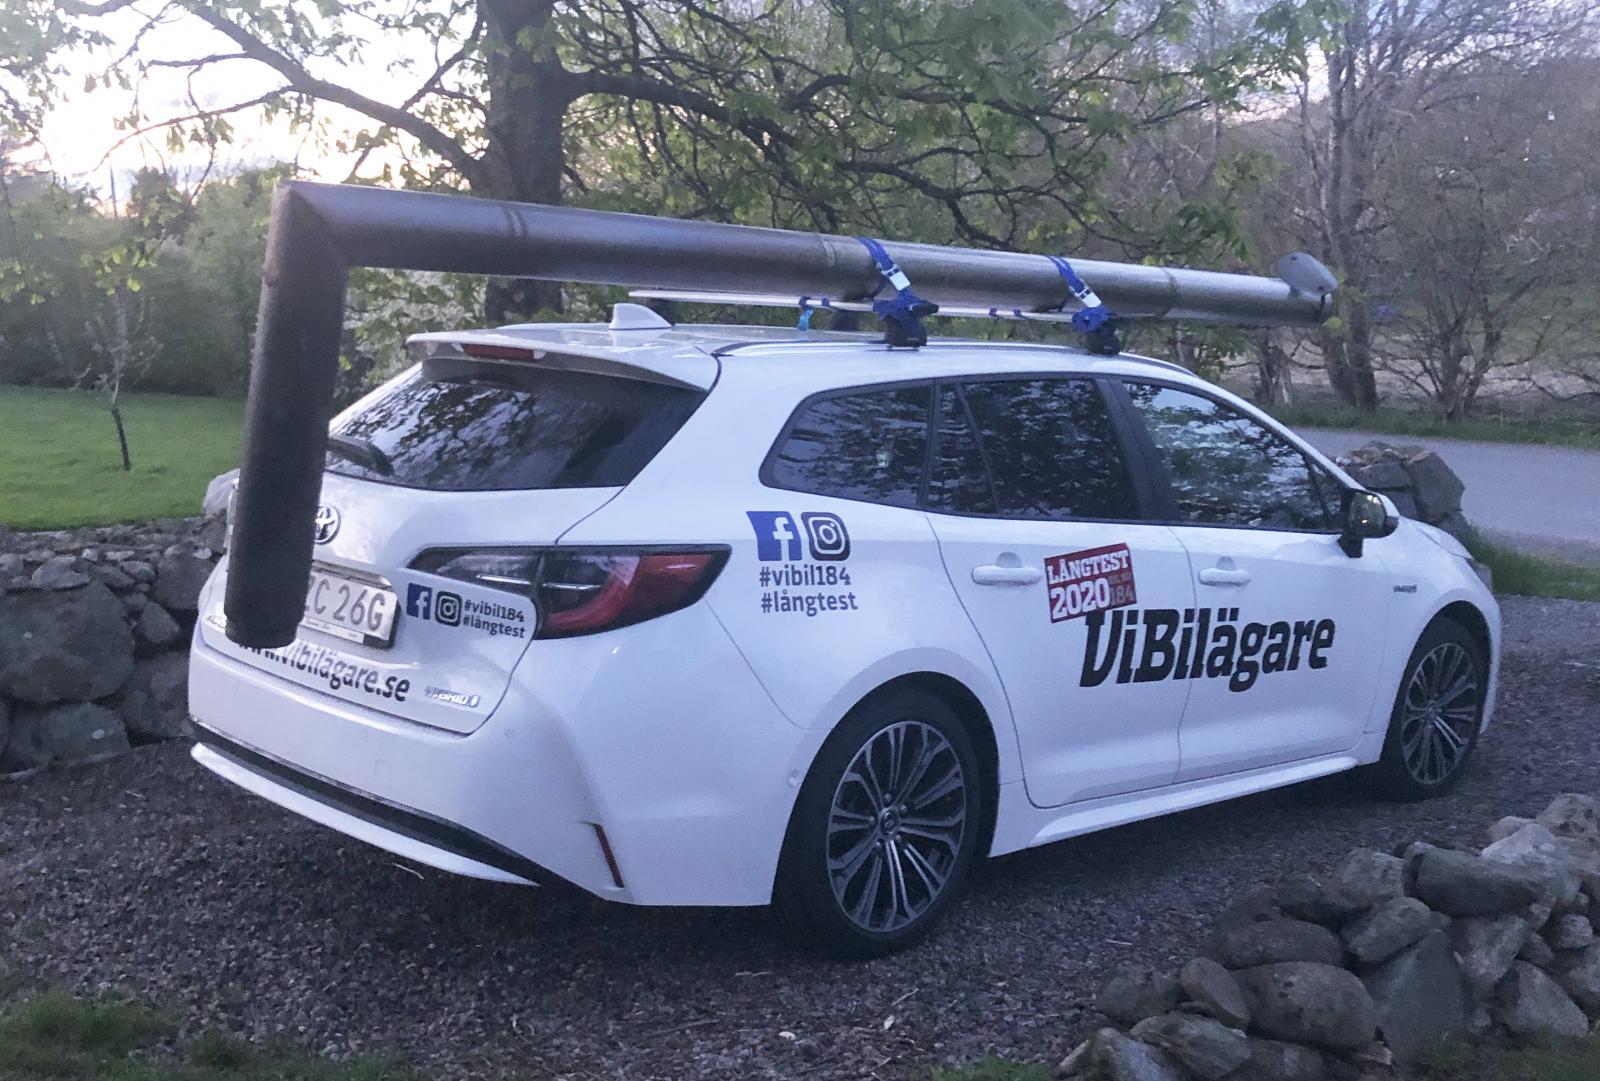 Långtest: Toyota Corolla Touring Sports (2020)